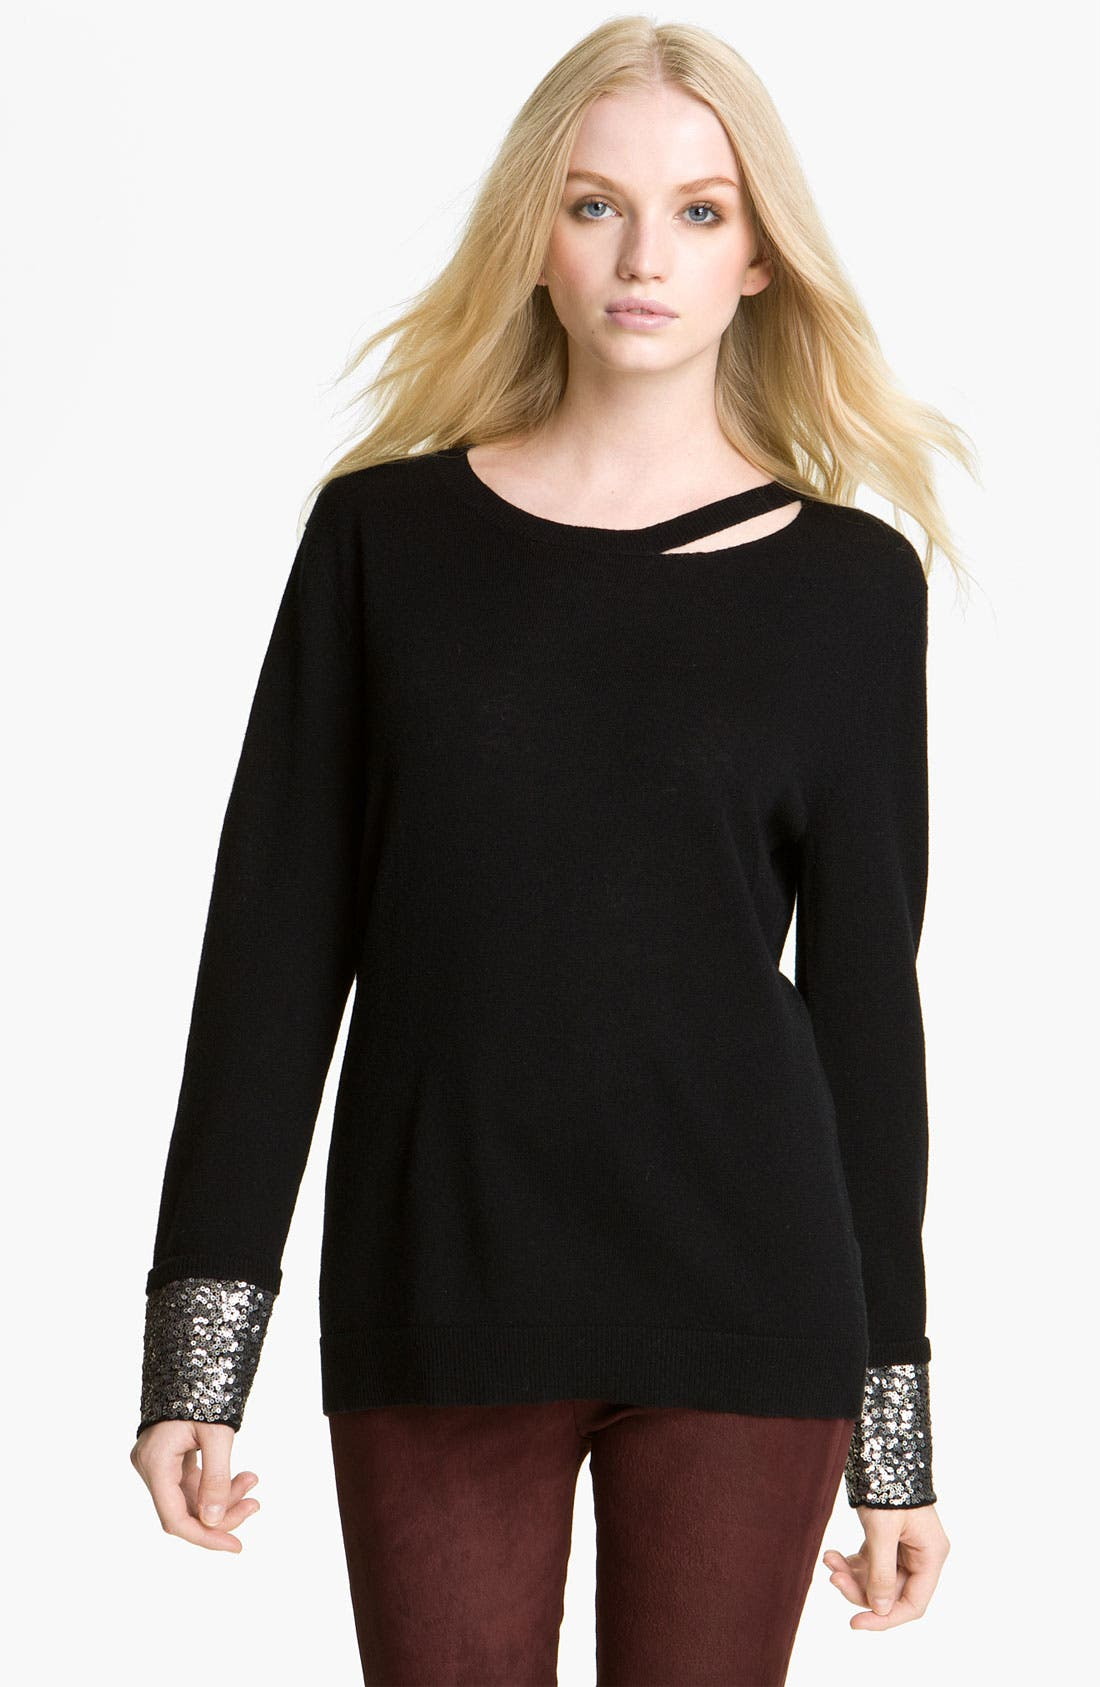 Main Image - Zadig & Voltaire 'Cygne' Sequin Cuff Sweater